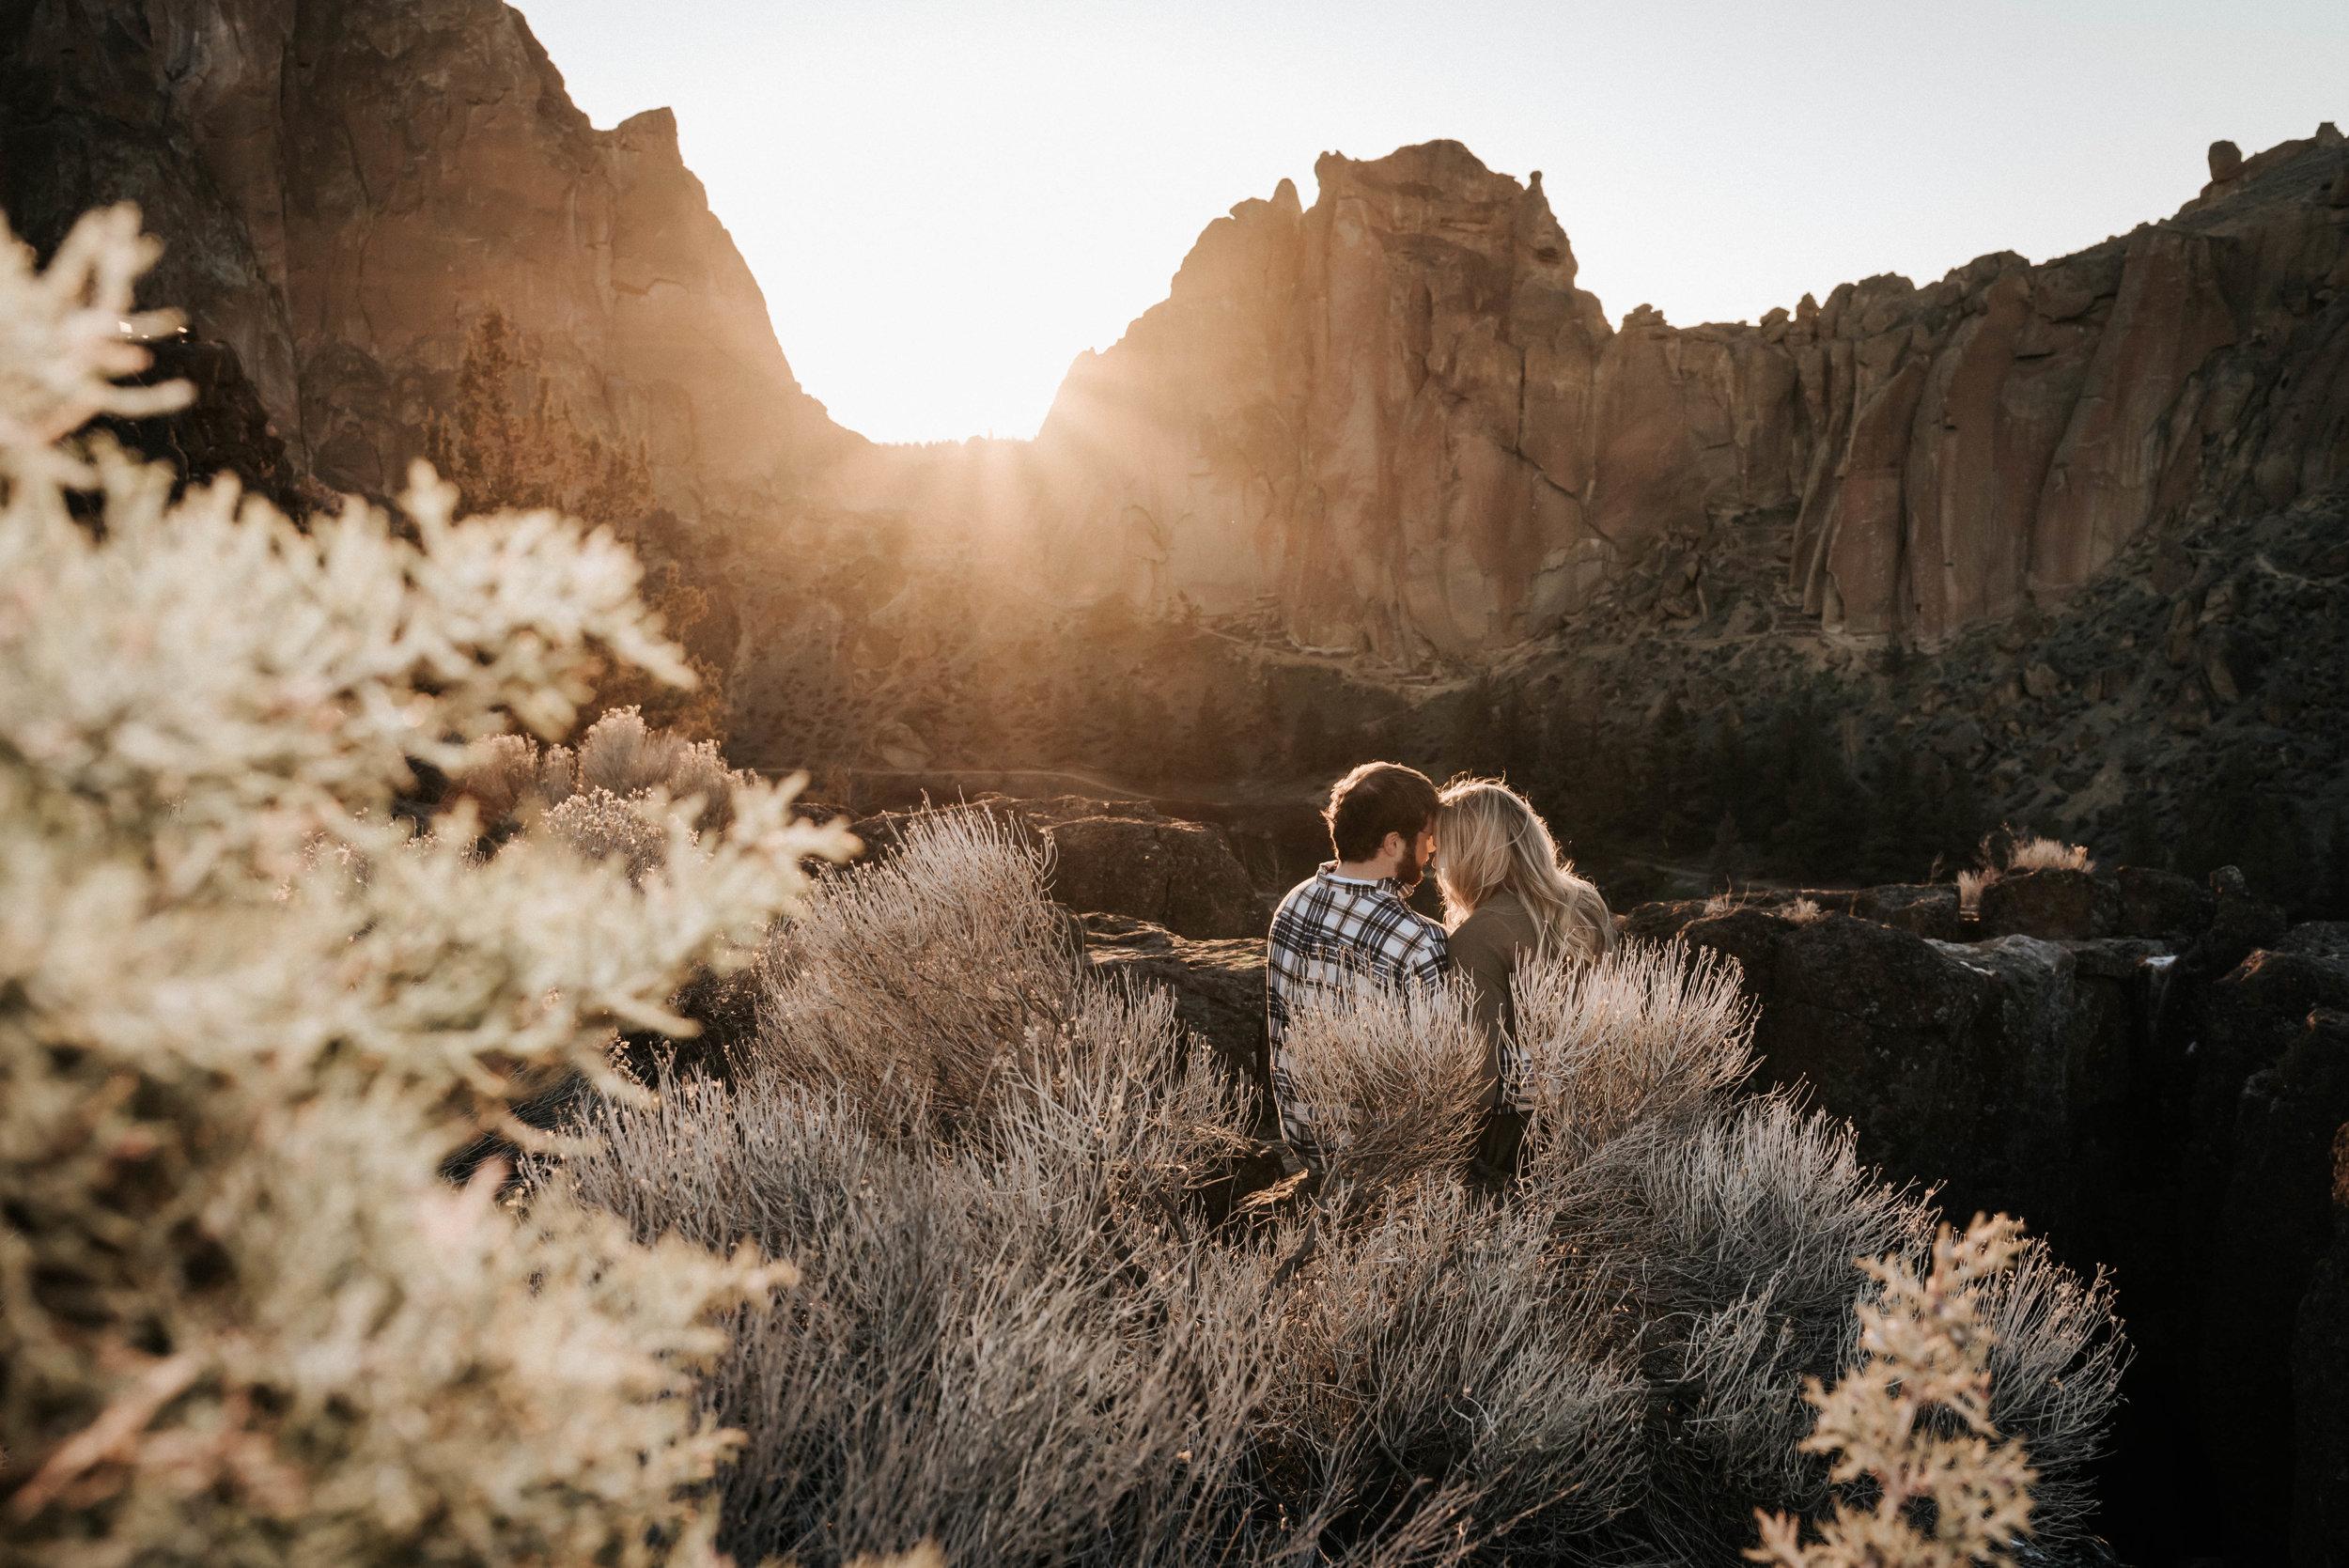 Brianna Bender Photography - Hannah & Jake (38 of 49).JPG